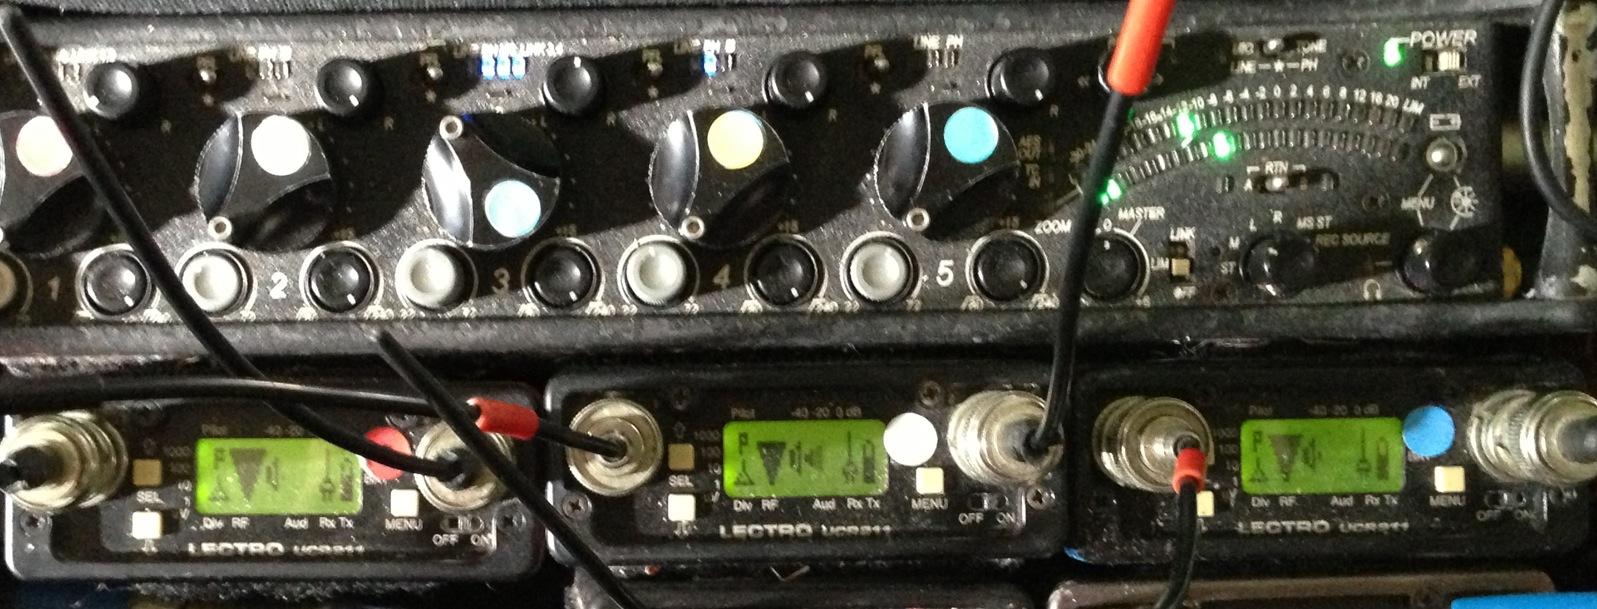 freelance sound recordist marty fay location equipment audio brisbane queensland